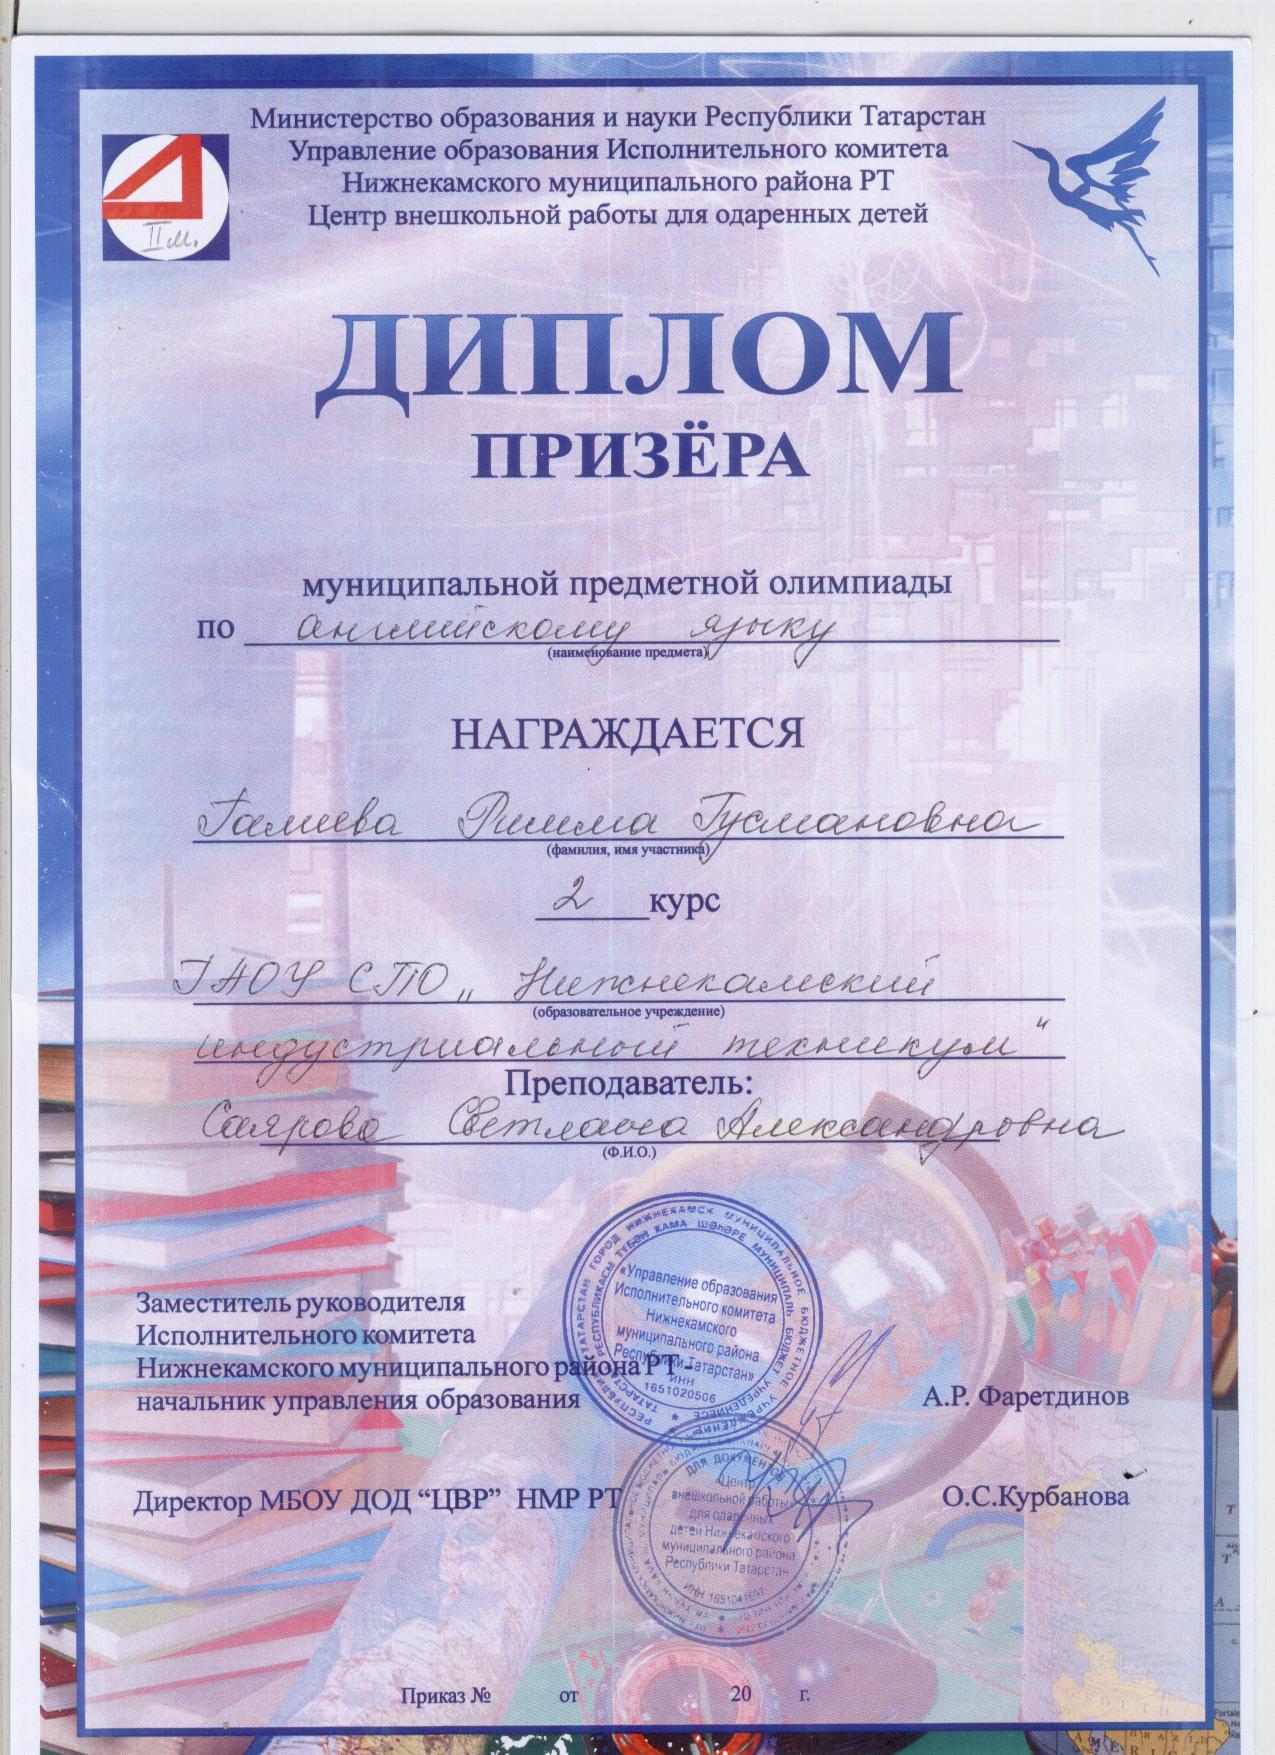 F:\Всероссйский конкурс Портфолио выпускника\РИММА\Римма 003.jpg